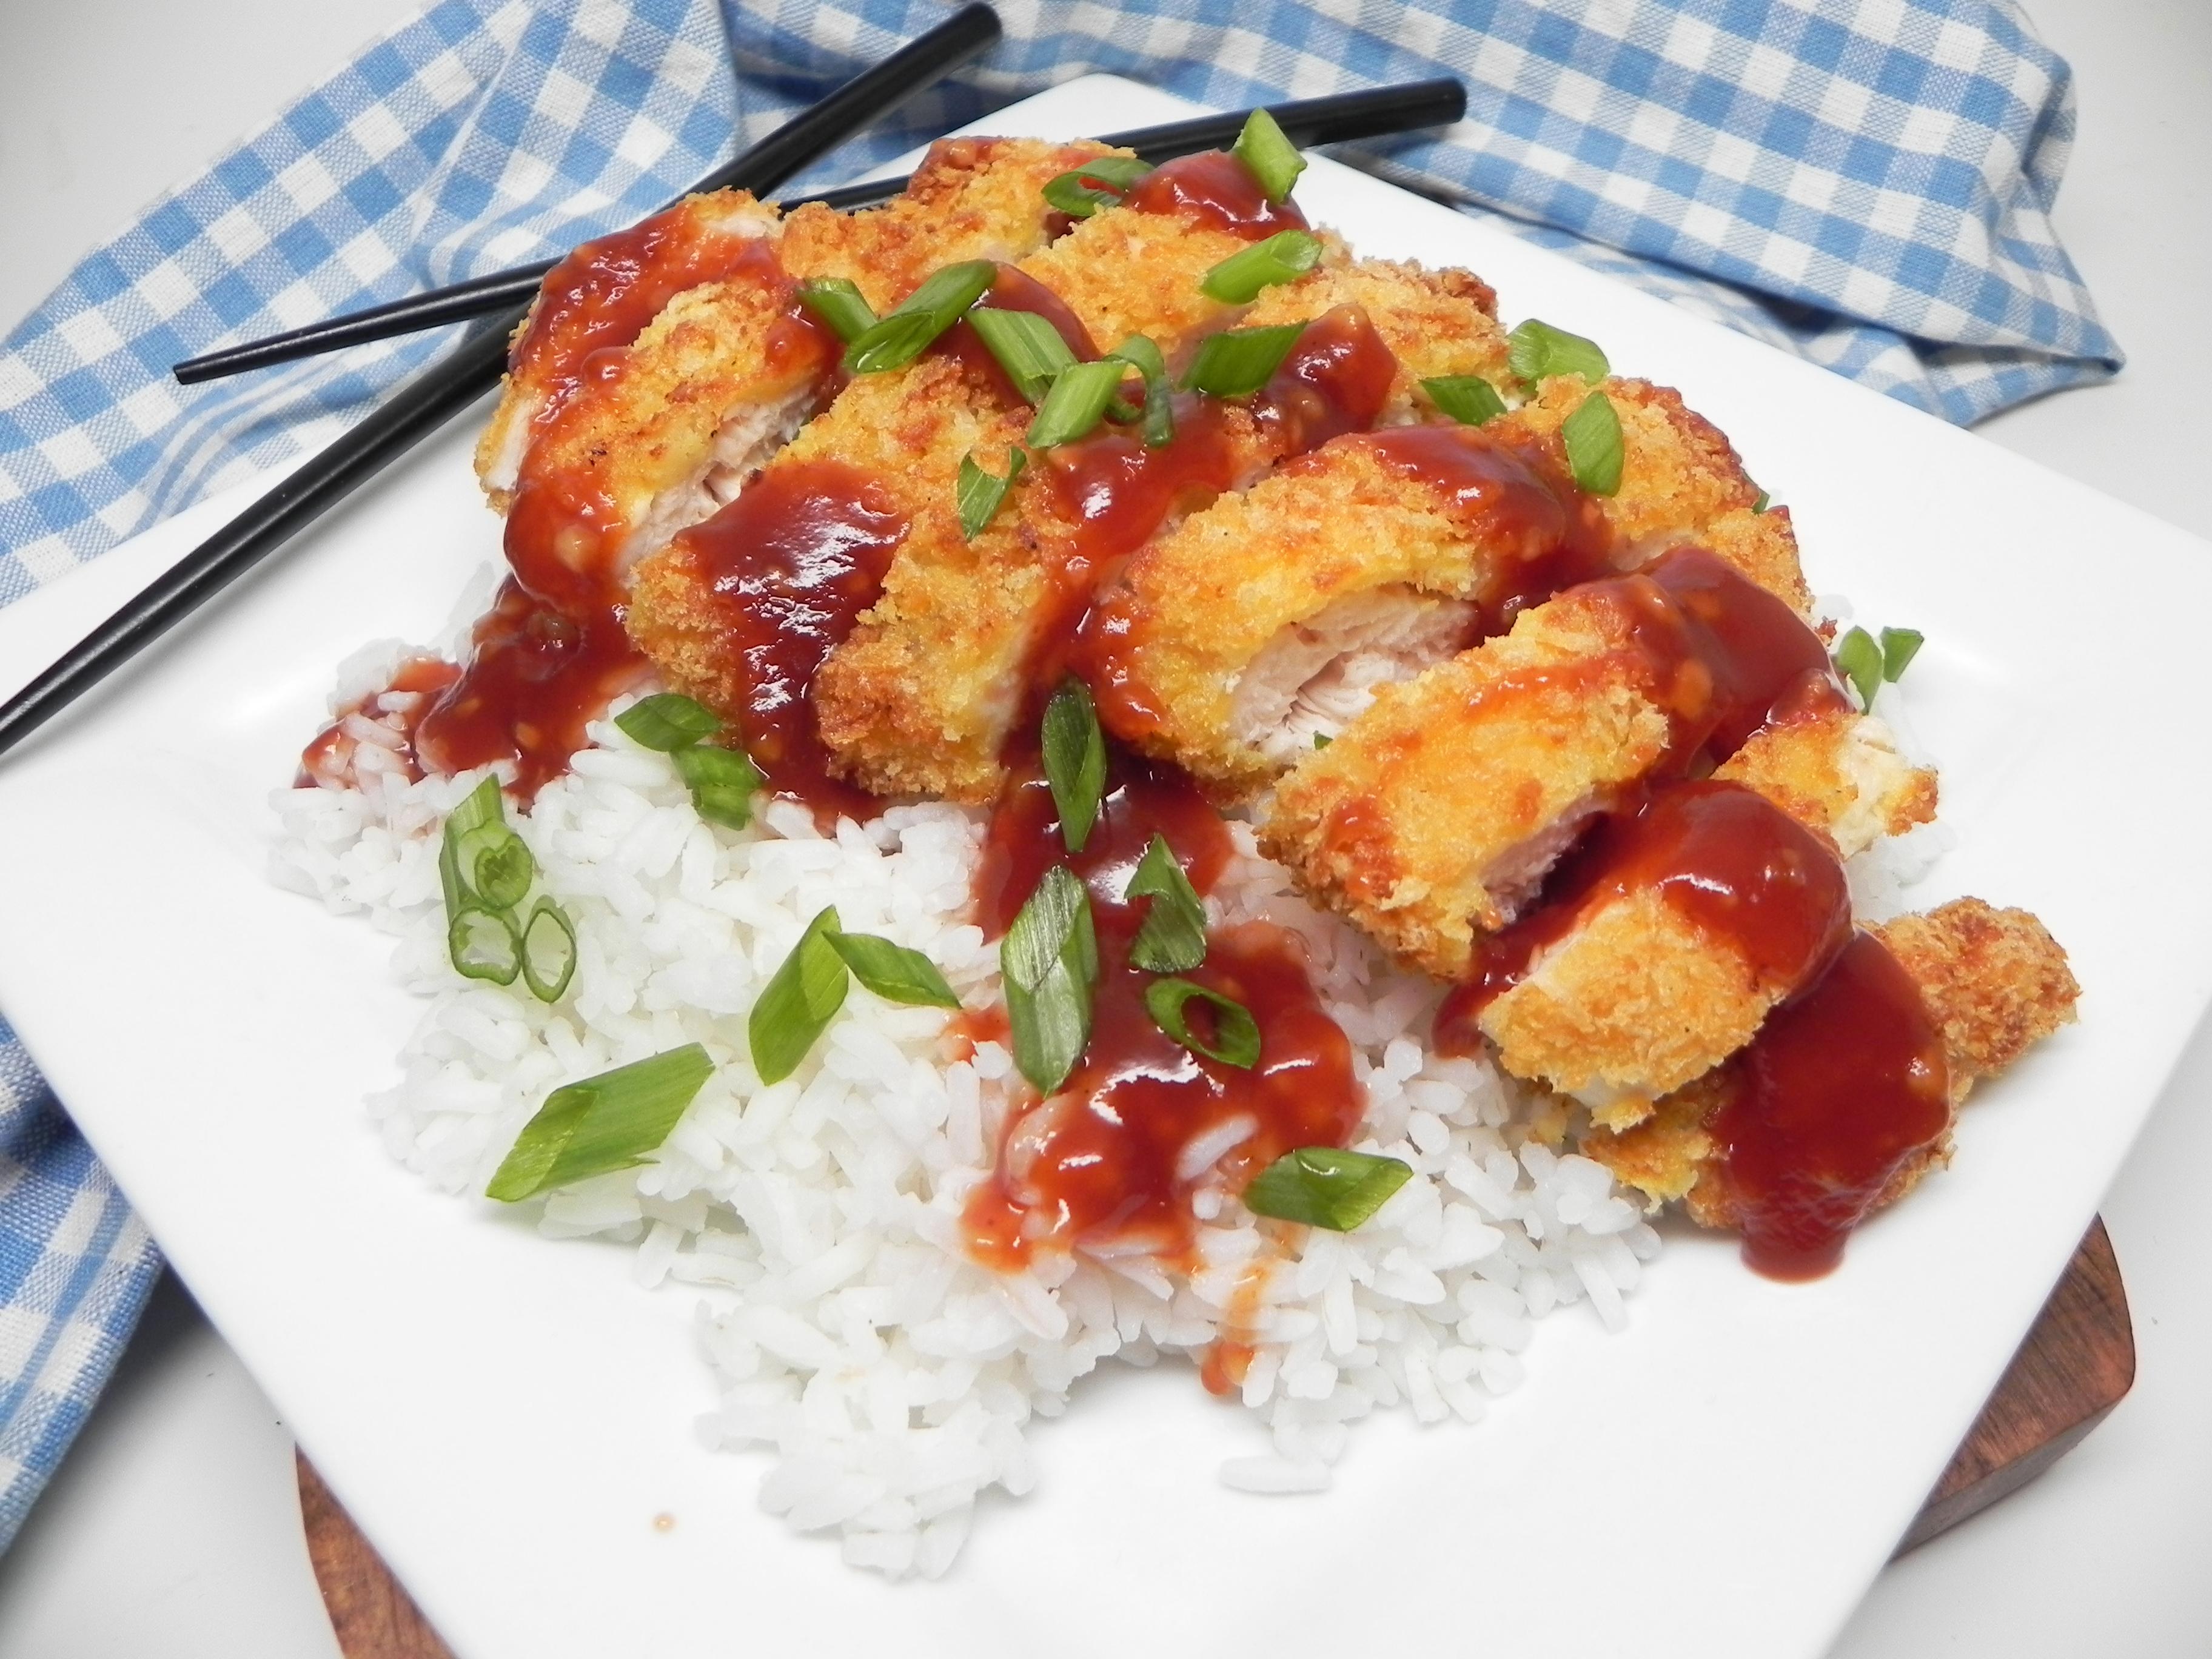 Air Fryer Chicken Katsu With Homemade Katsu Sauce Recipe Allrecipes